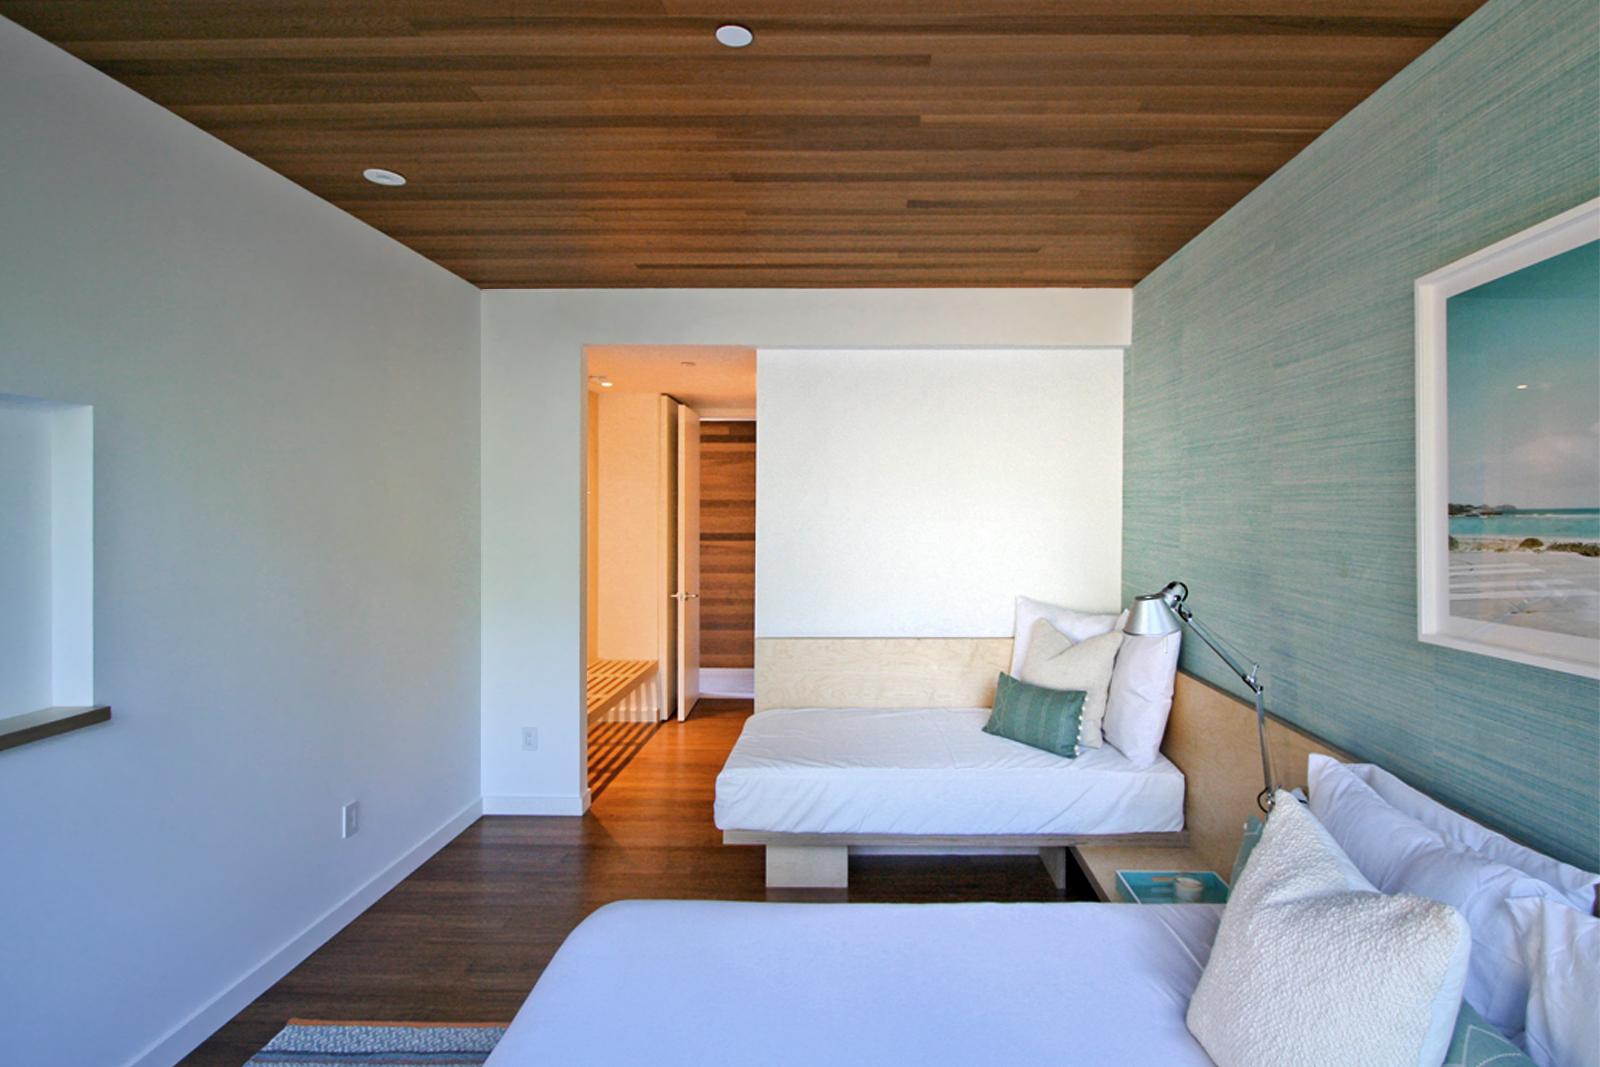 res4-resolution-4-architecture-modern-modular-house-prefab-amagansett-addition-bedroom-perspective-01.jpg